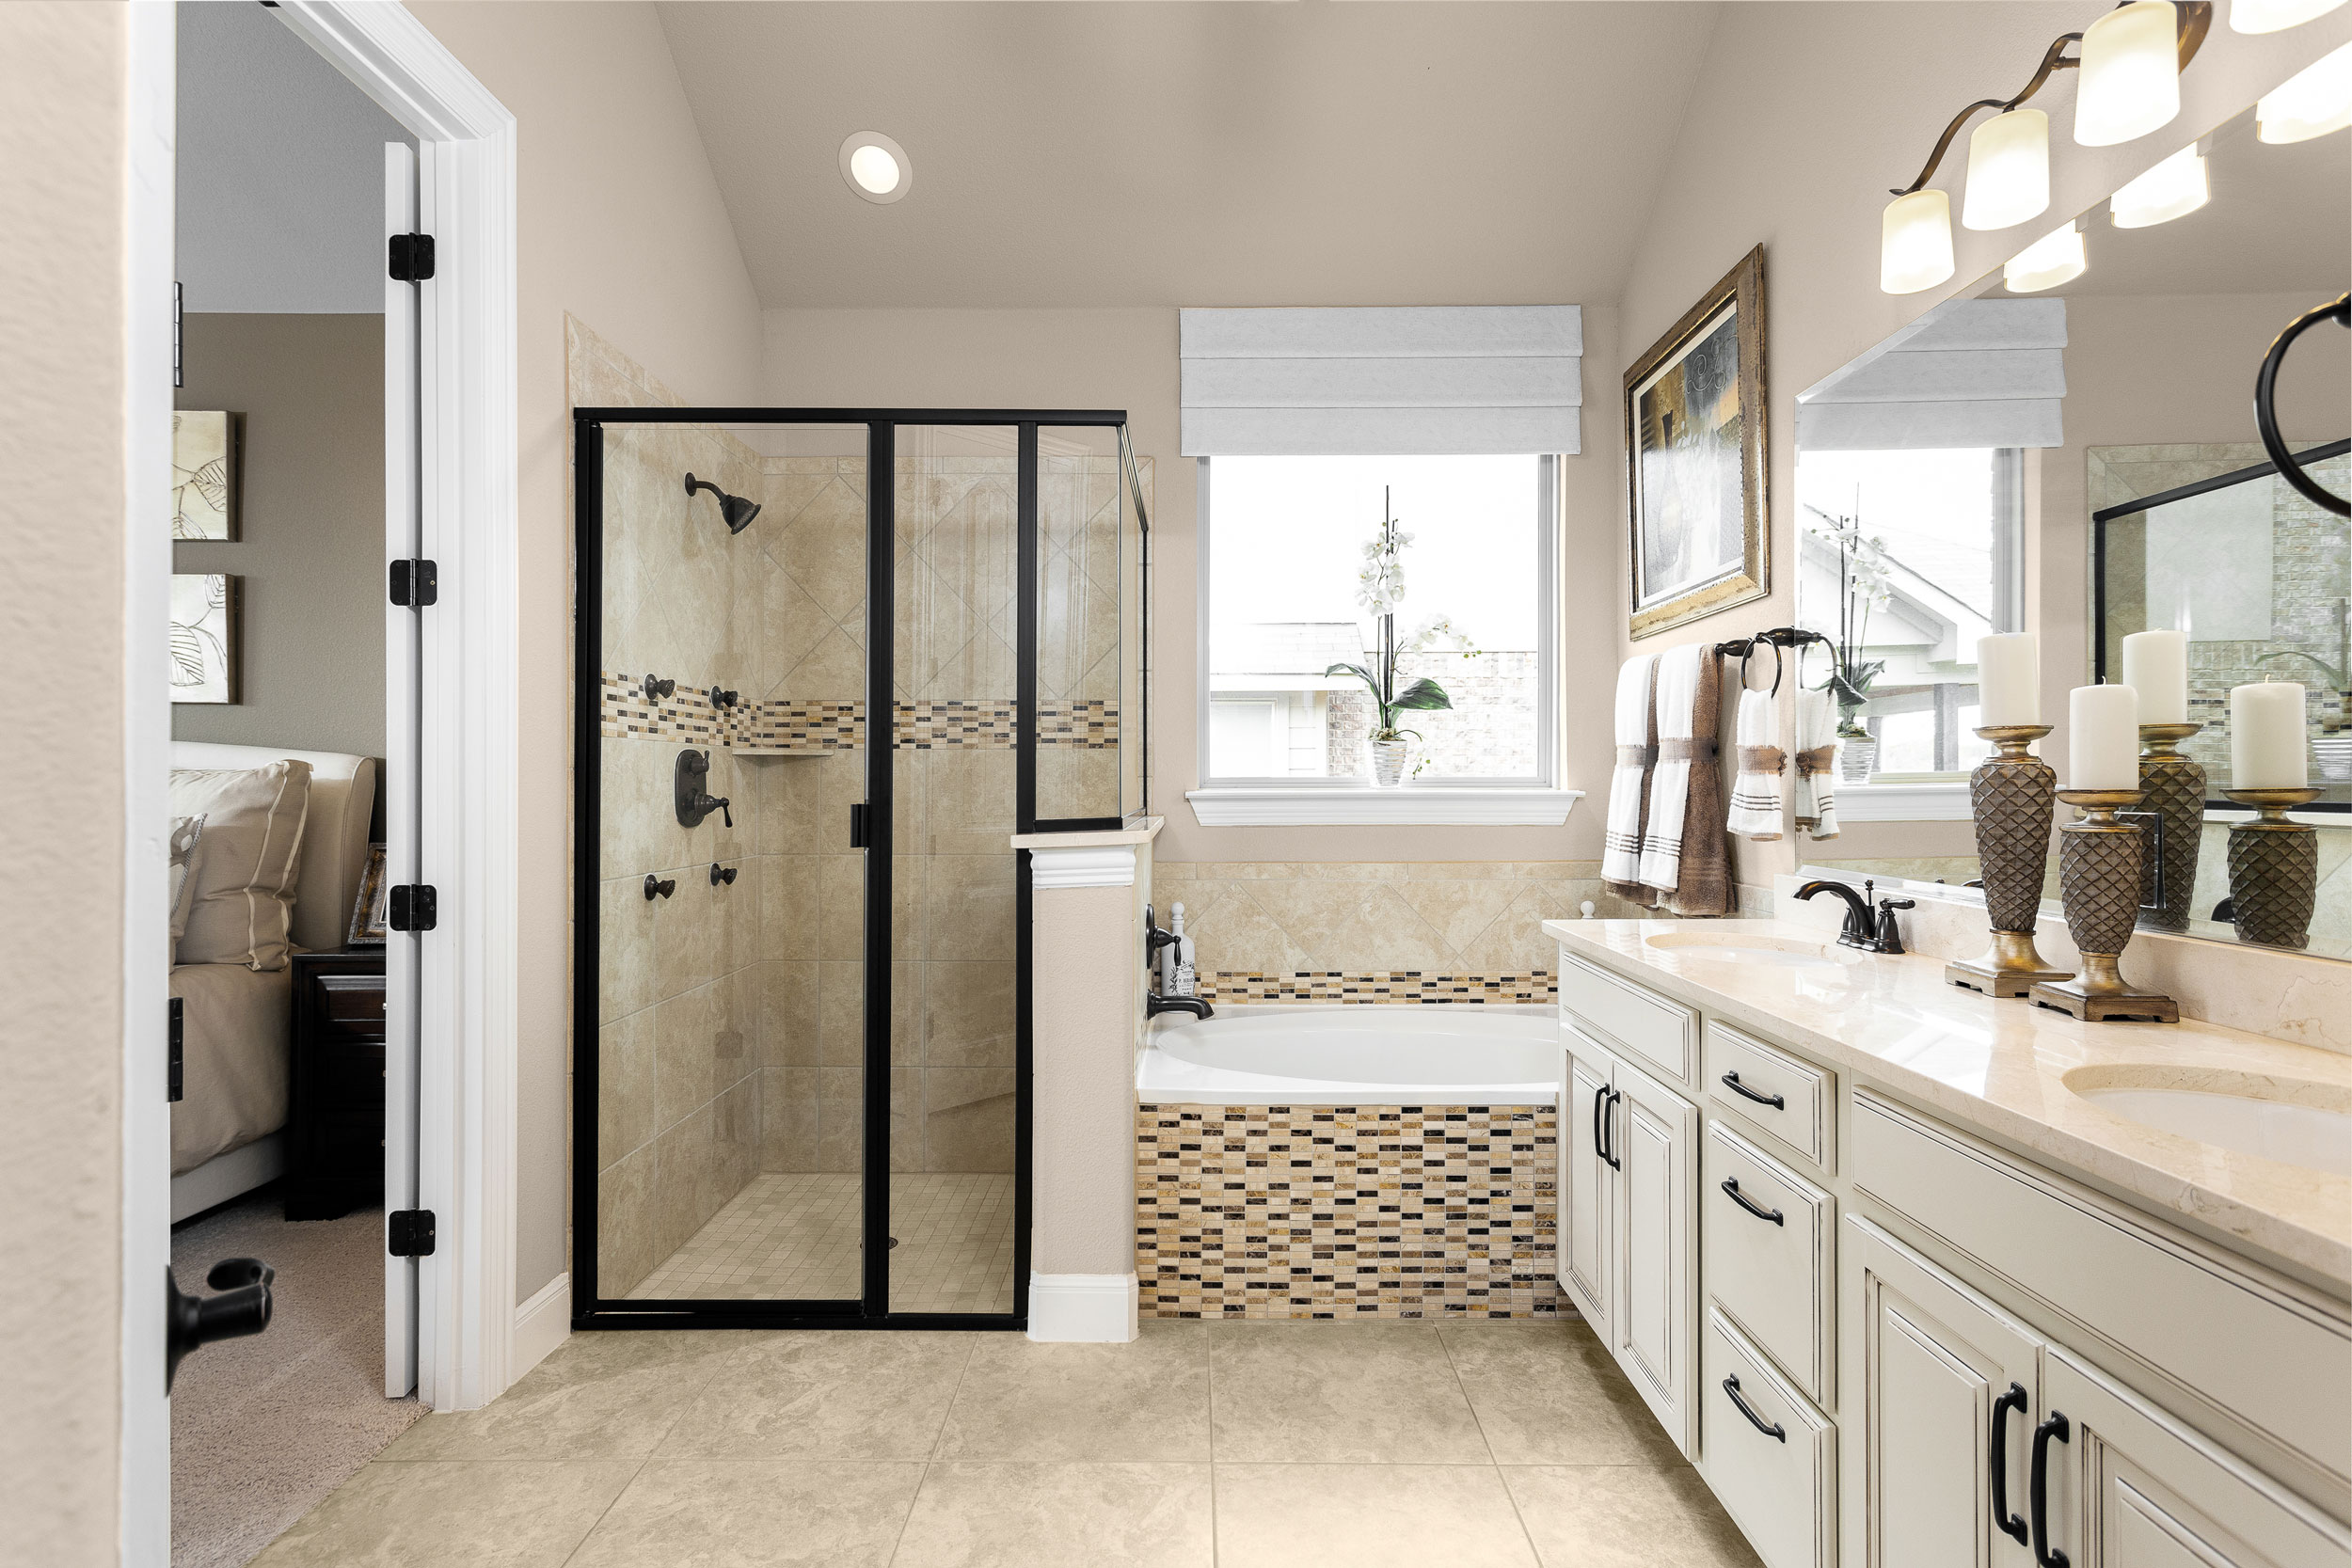 bathroom-design-brown-tones.jpg